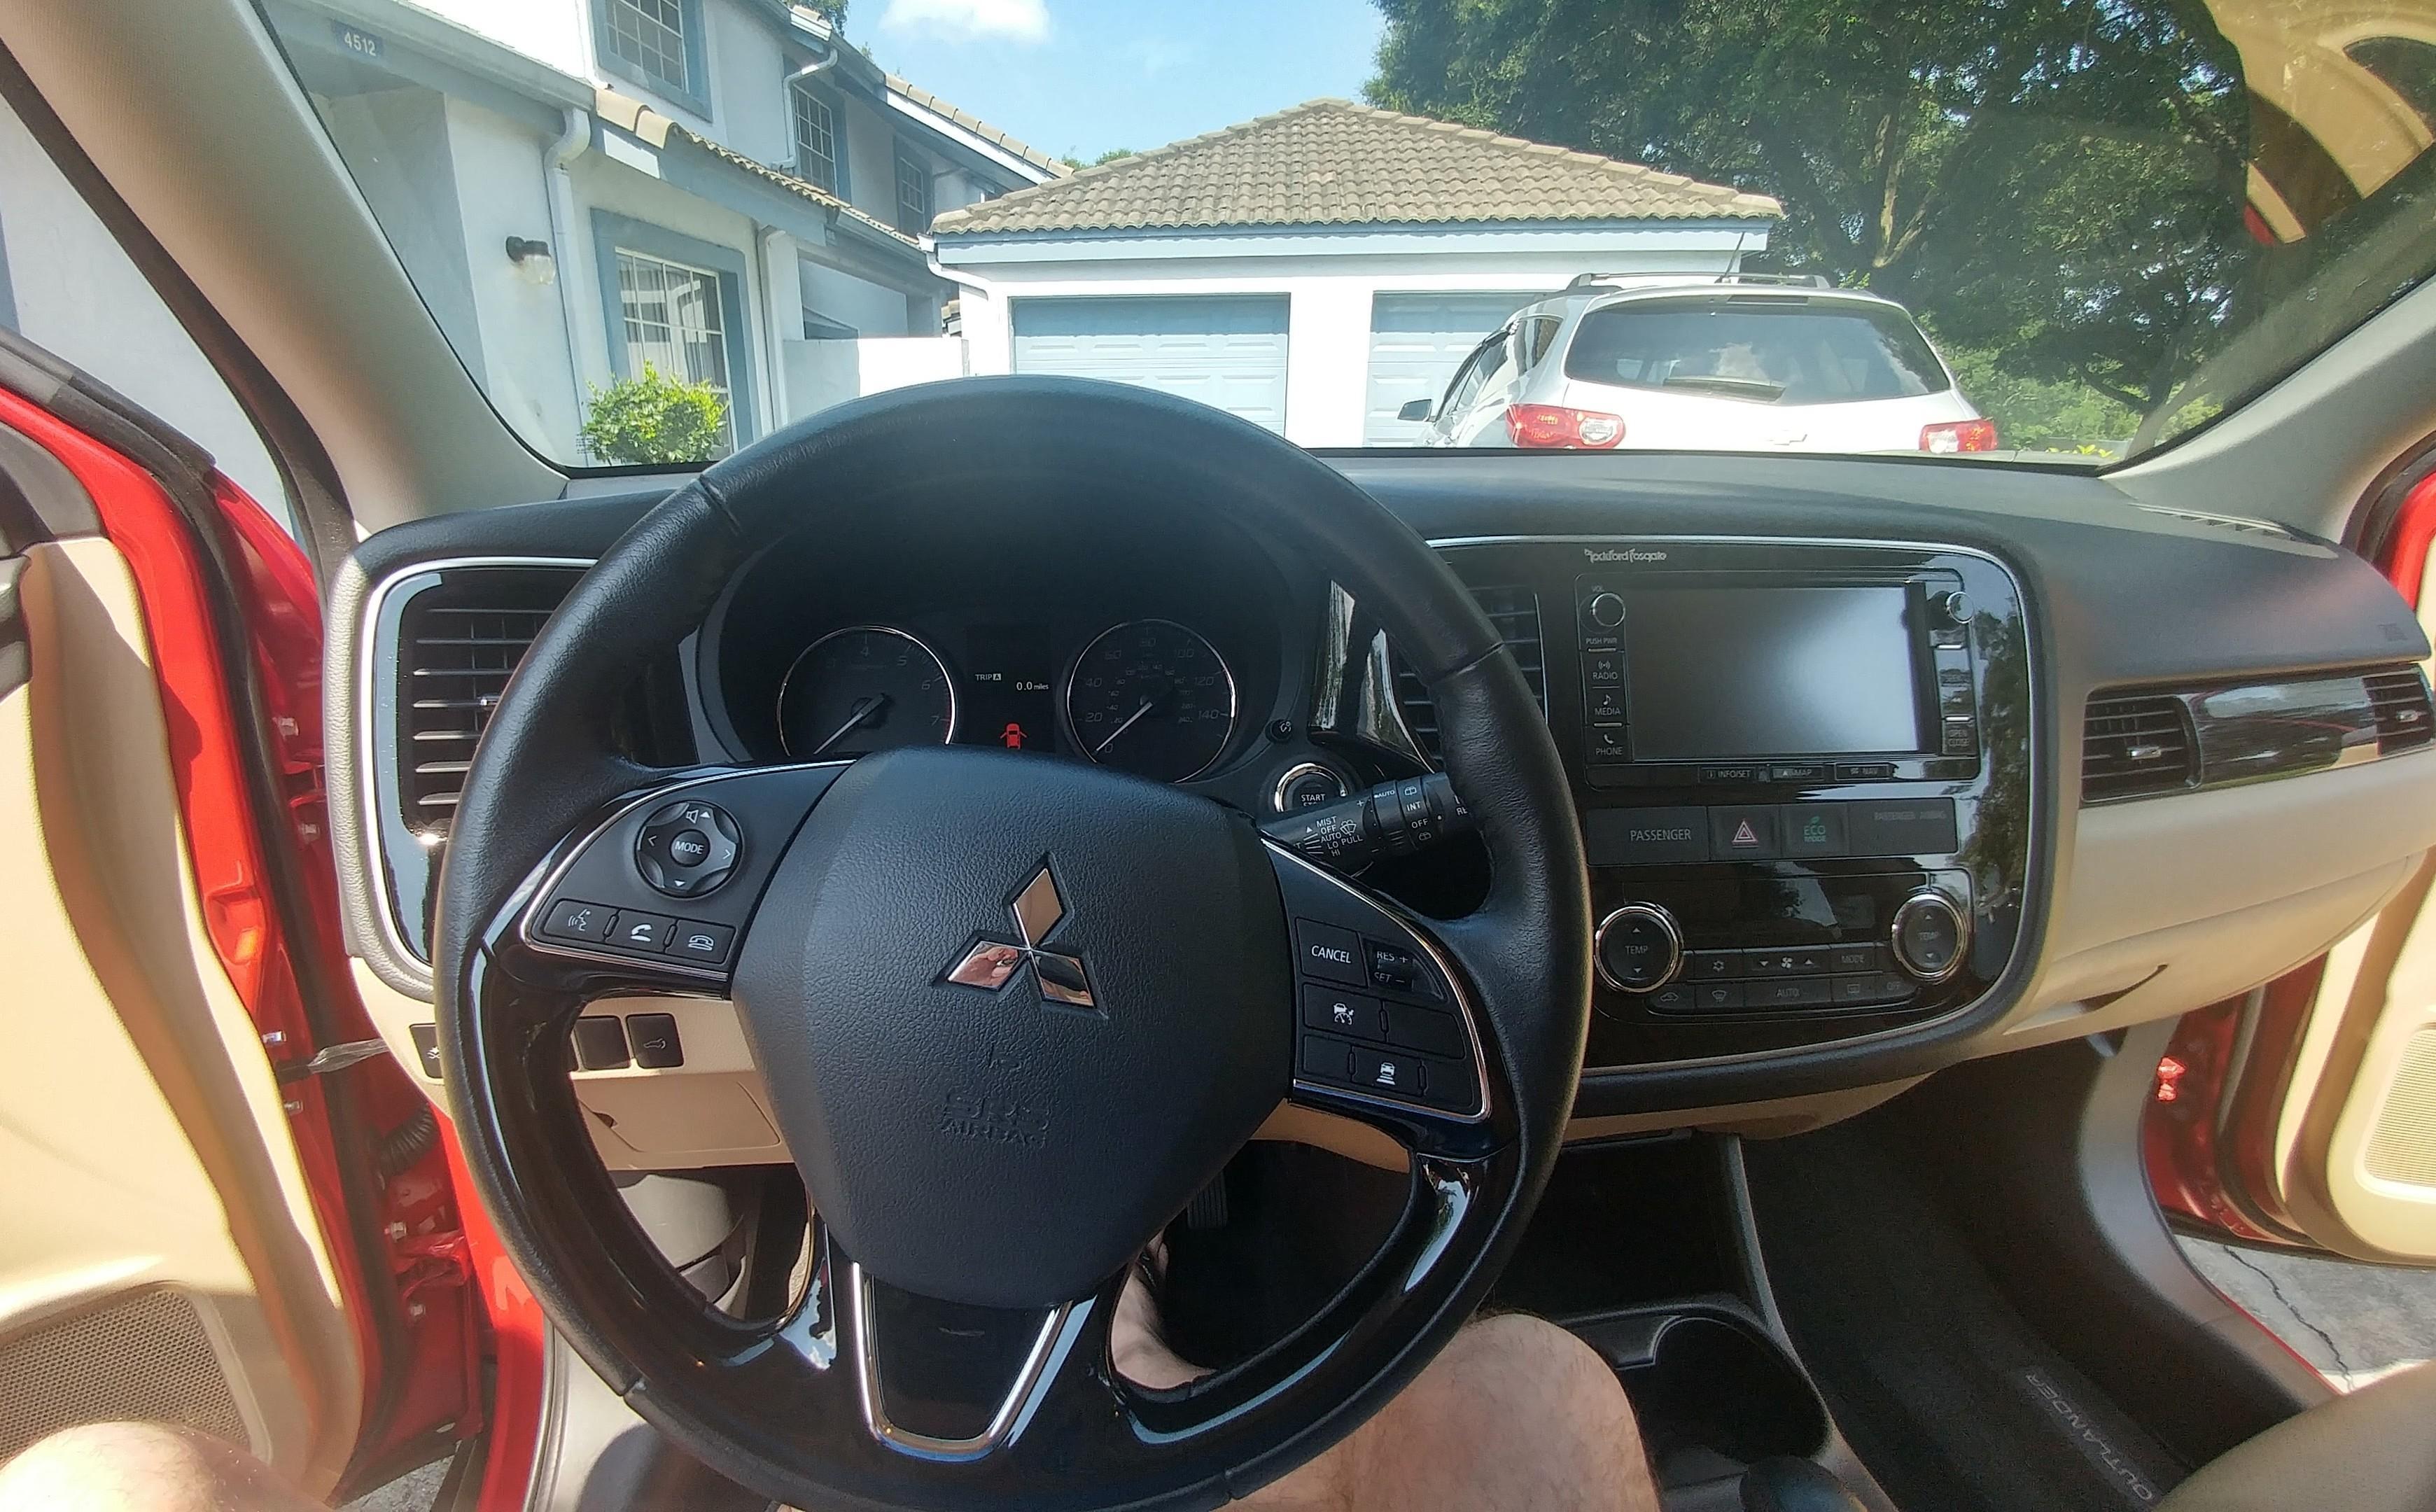 Mitsubishi Outlander instrument cluster and dashboard